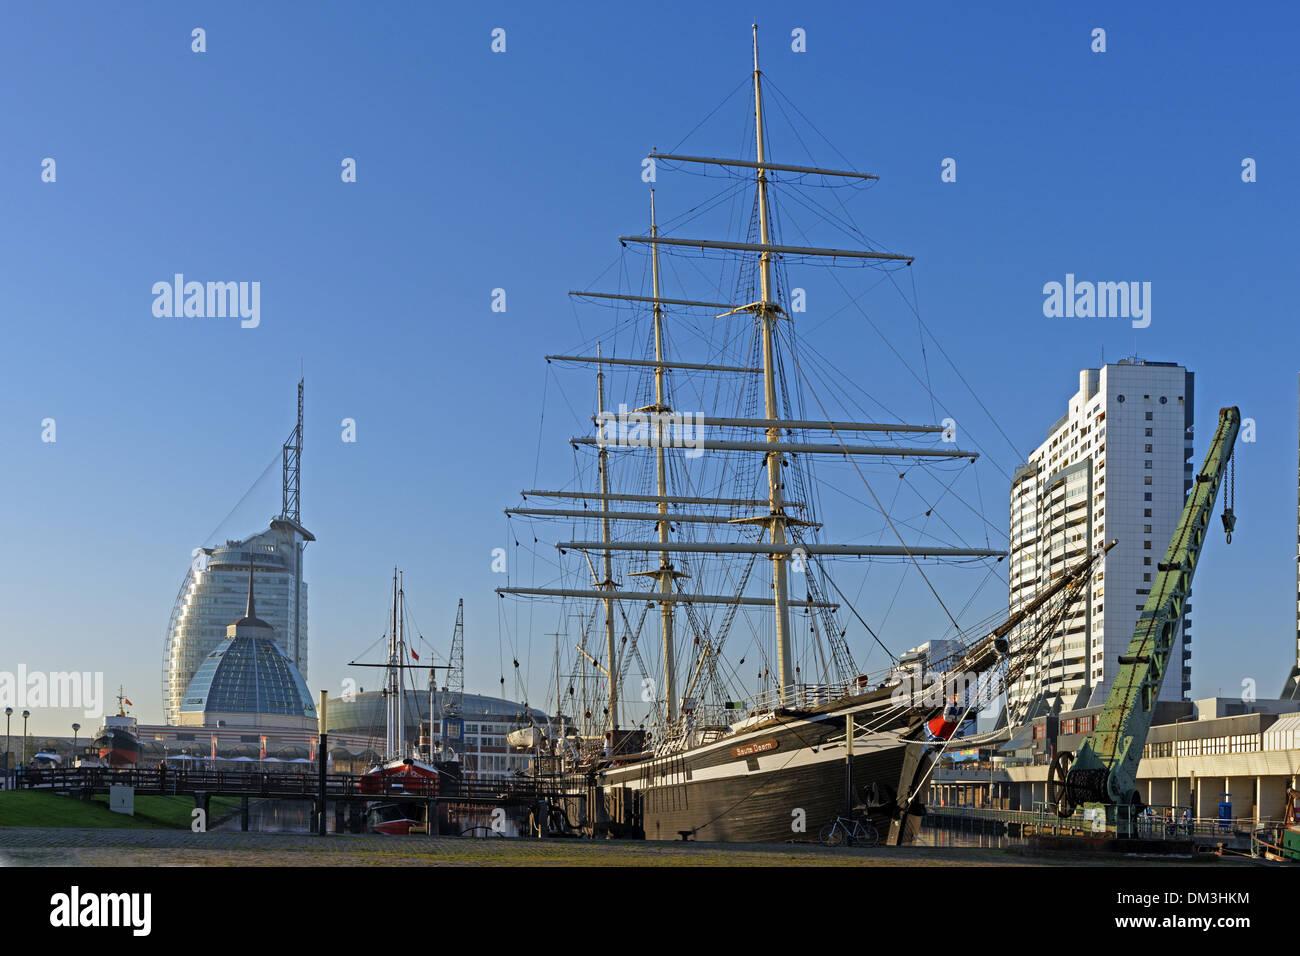 Europe Germany Bremen Bremerhaven Hans Scharoun square museum harbour German navigation museum sail ship SEUTE DEERN Stock Photo